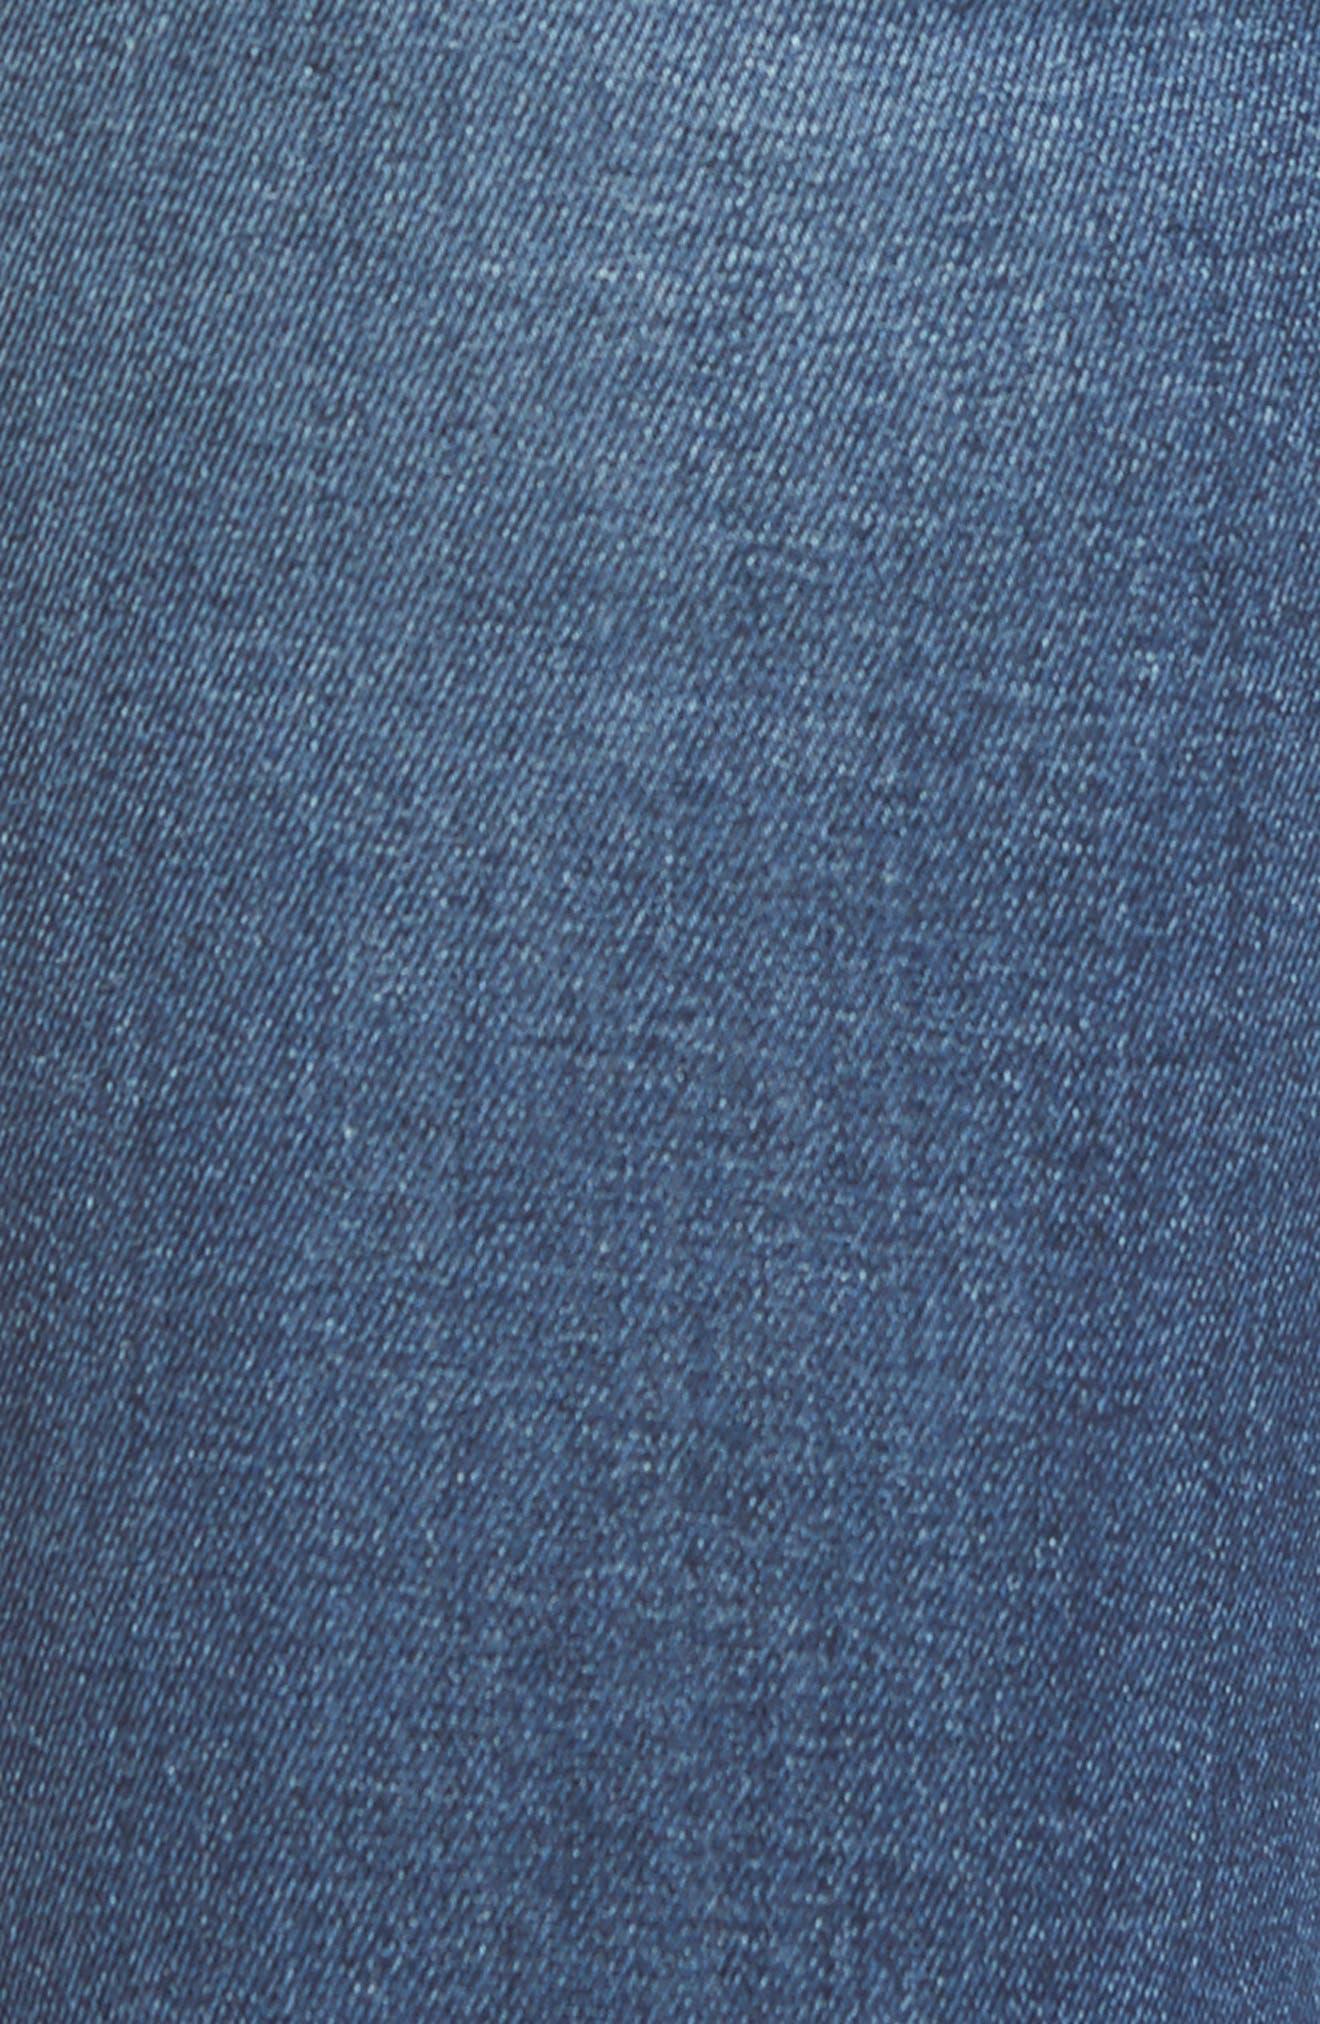 Emma Power Legging Jeans,                             Alternate thumbnail 5, color,                             405